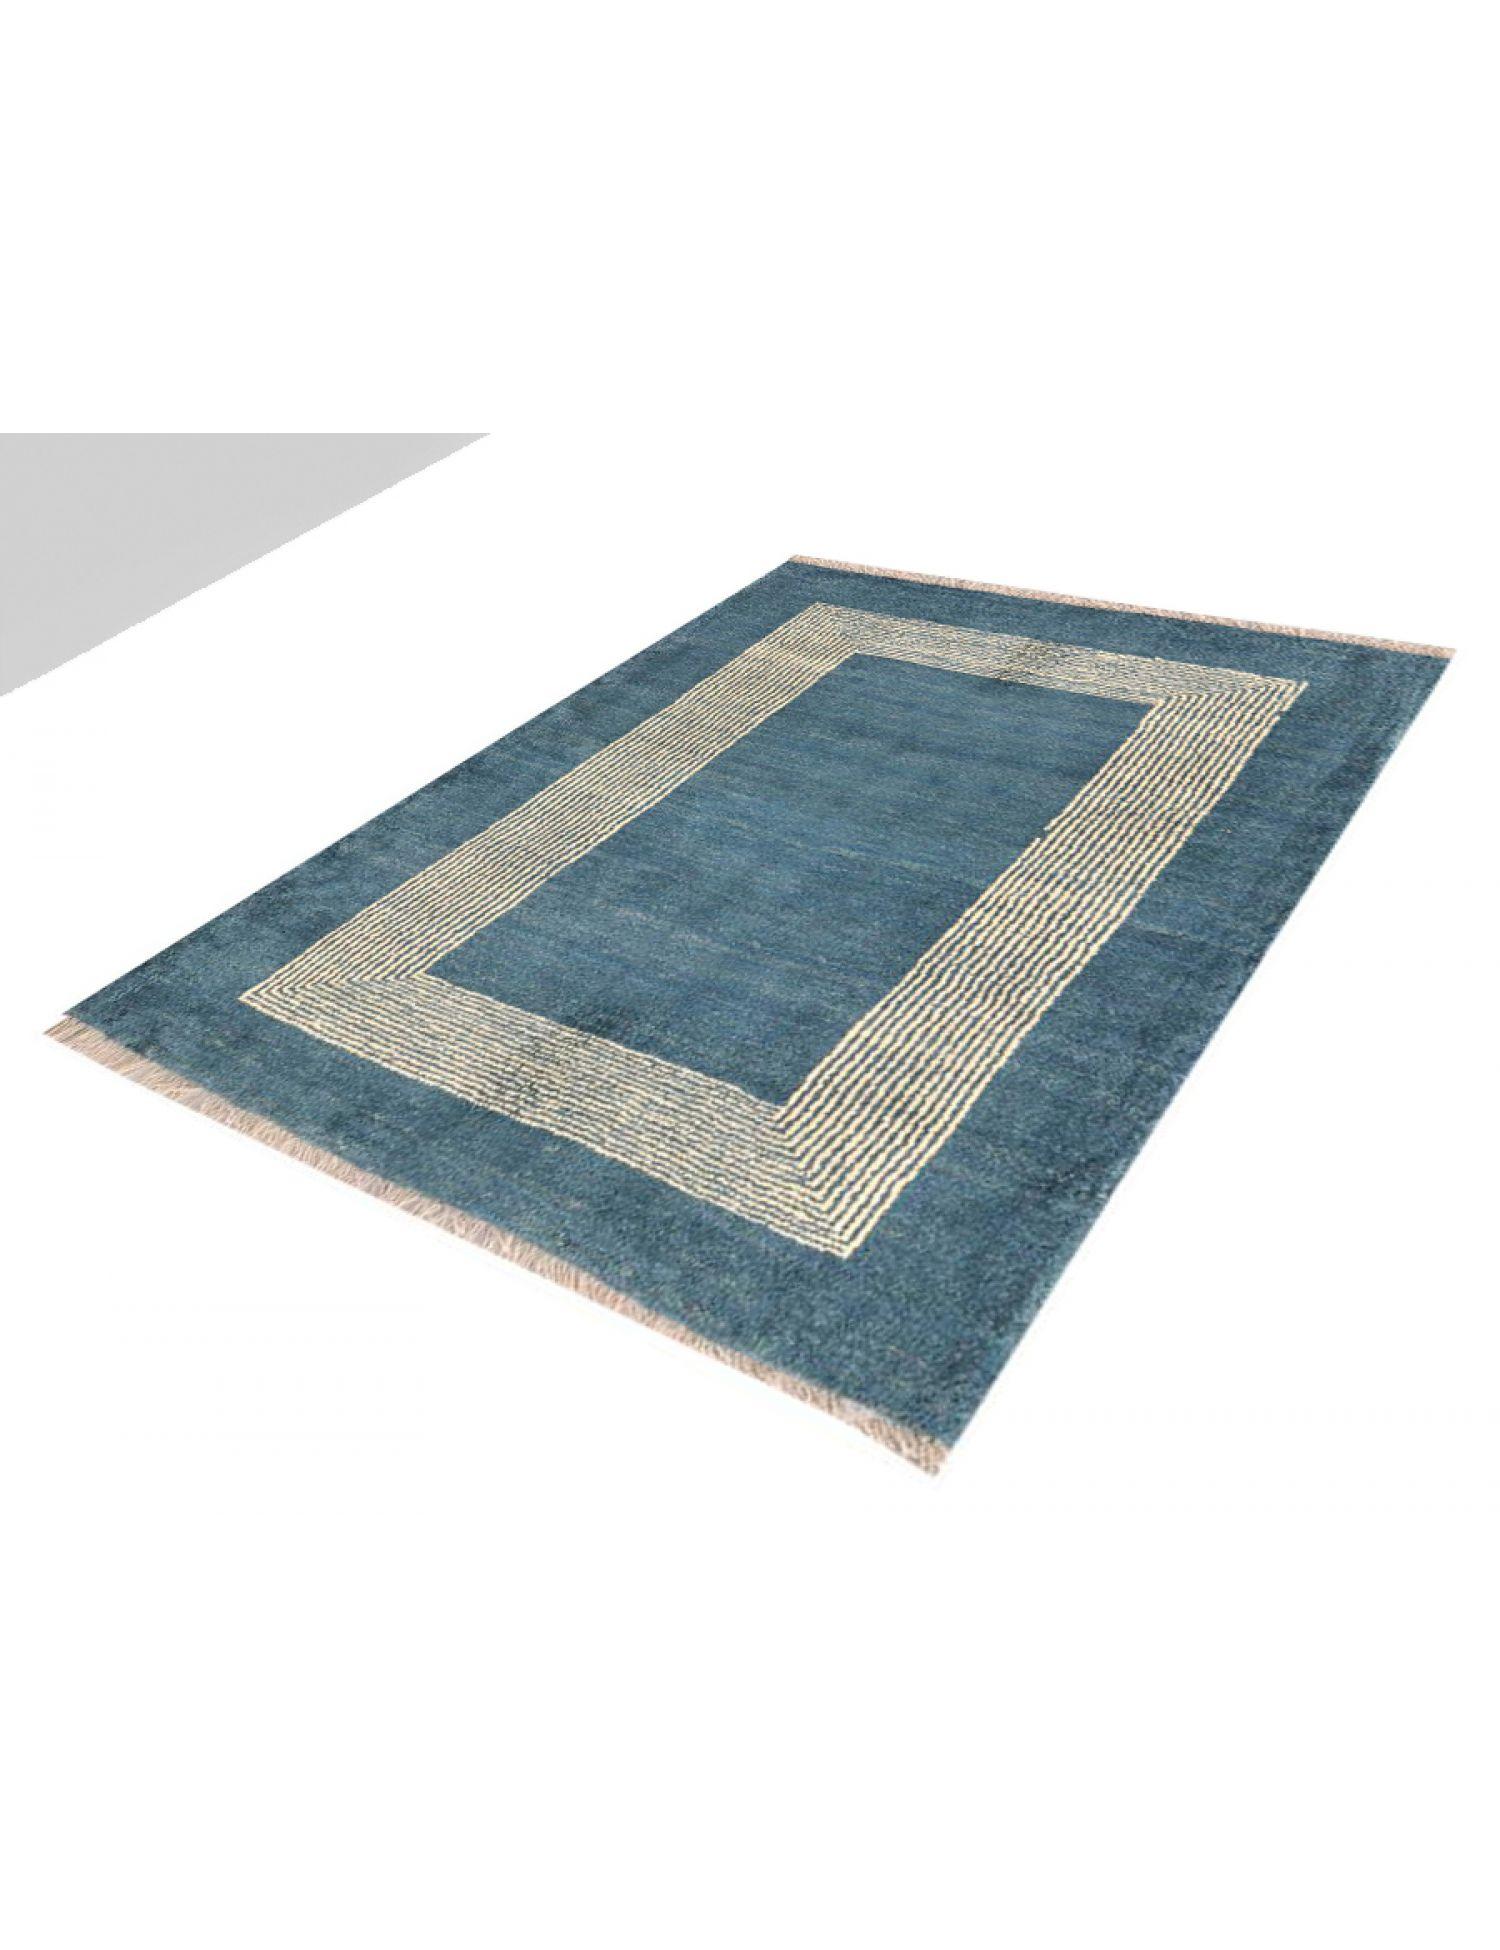 Moderne Teppiche  blau <br/>143 x 117 cm